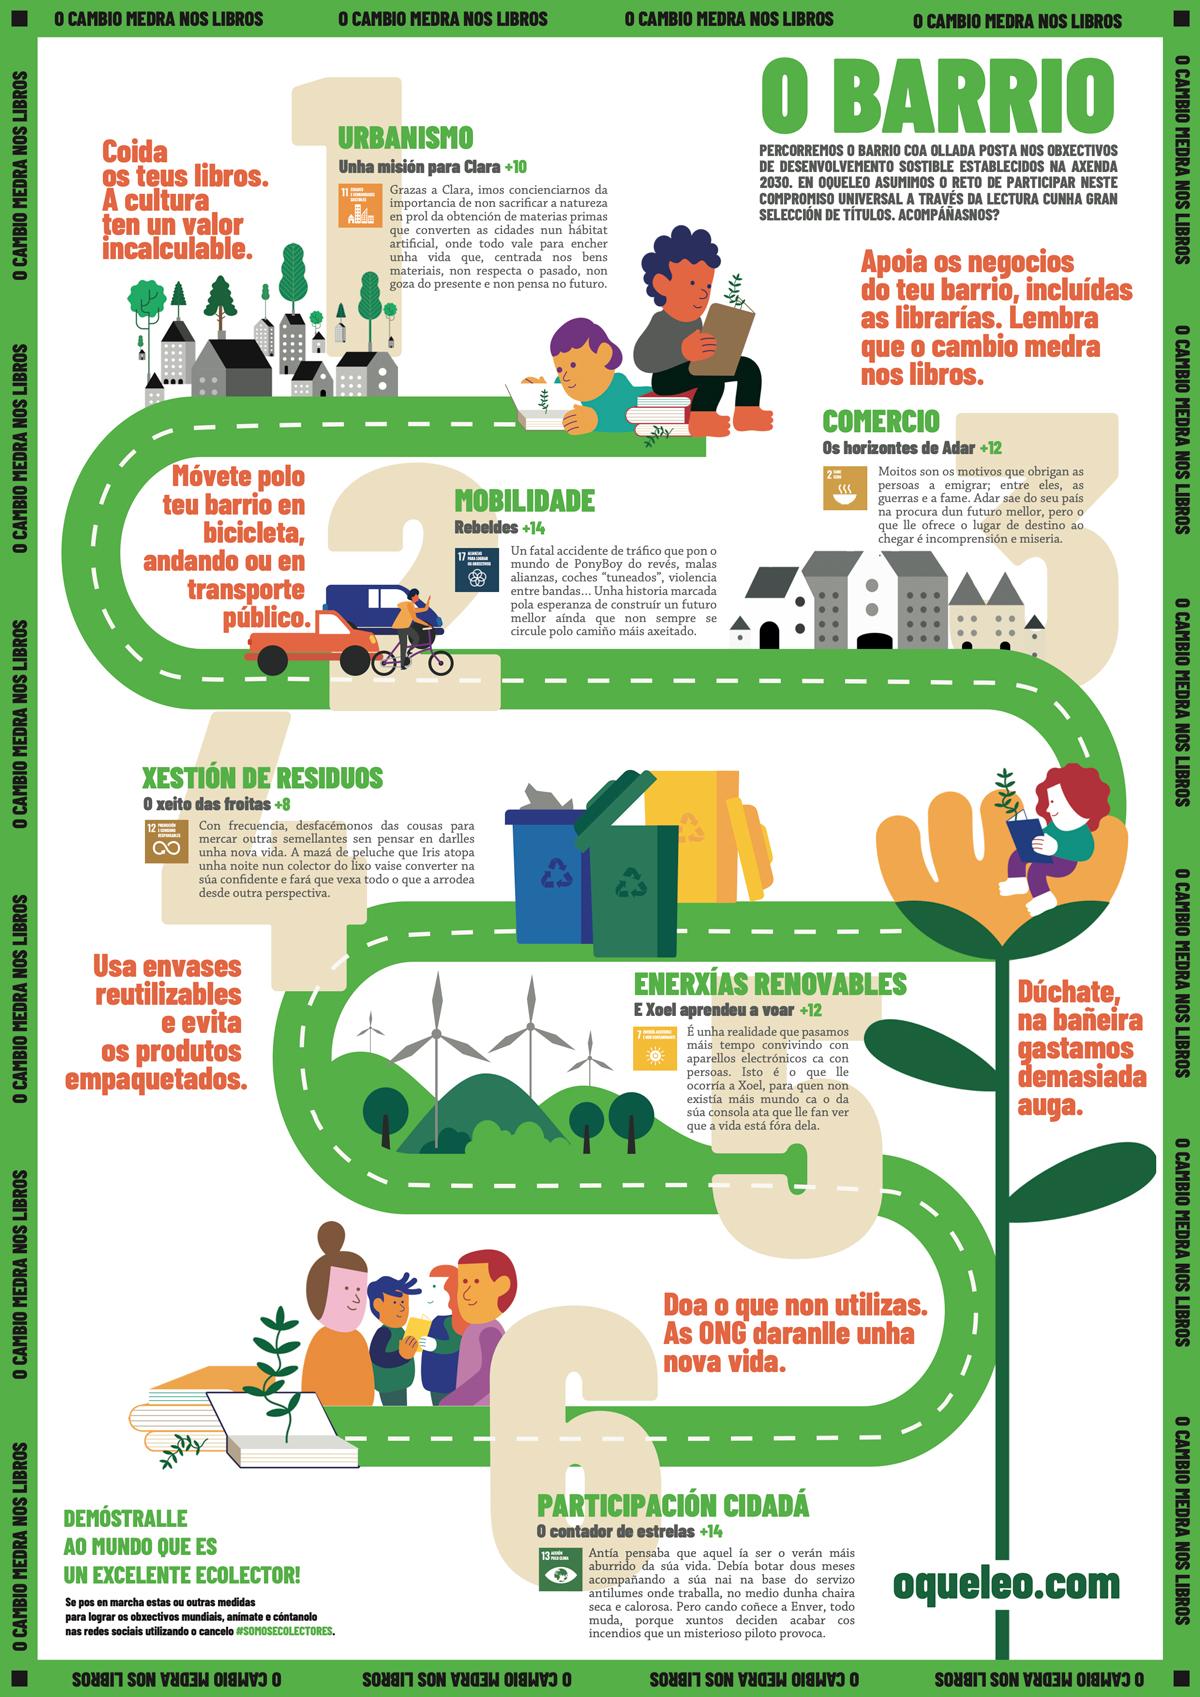 Infografía Ecolectores